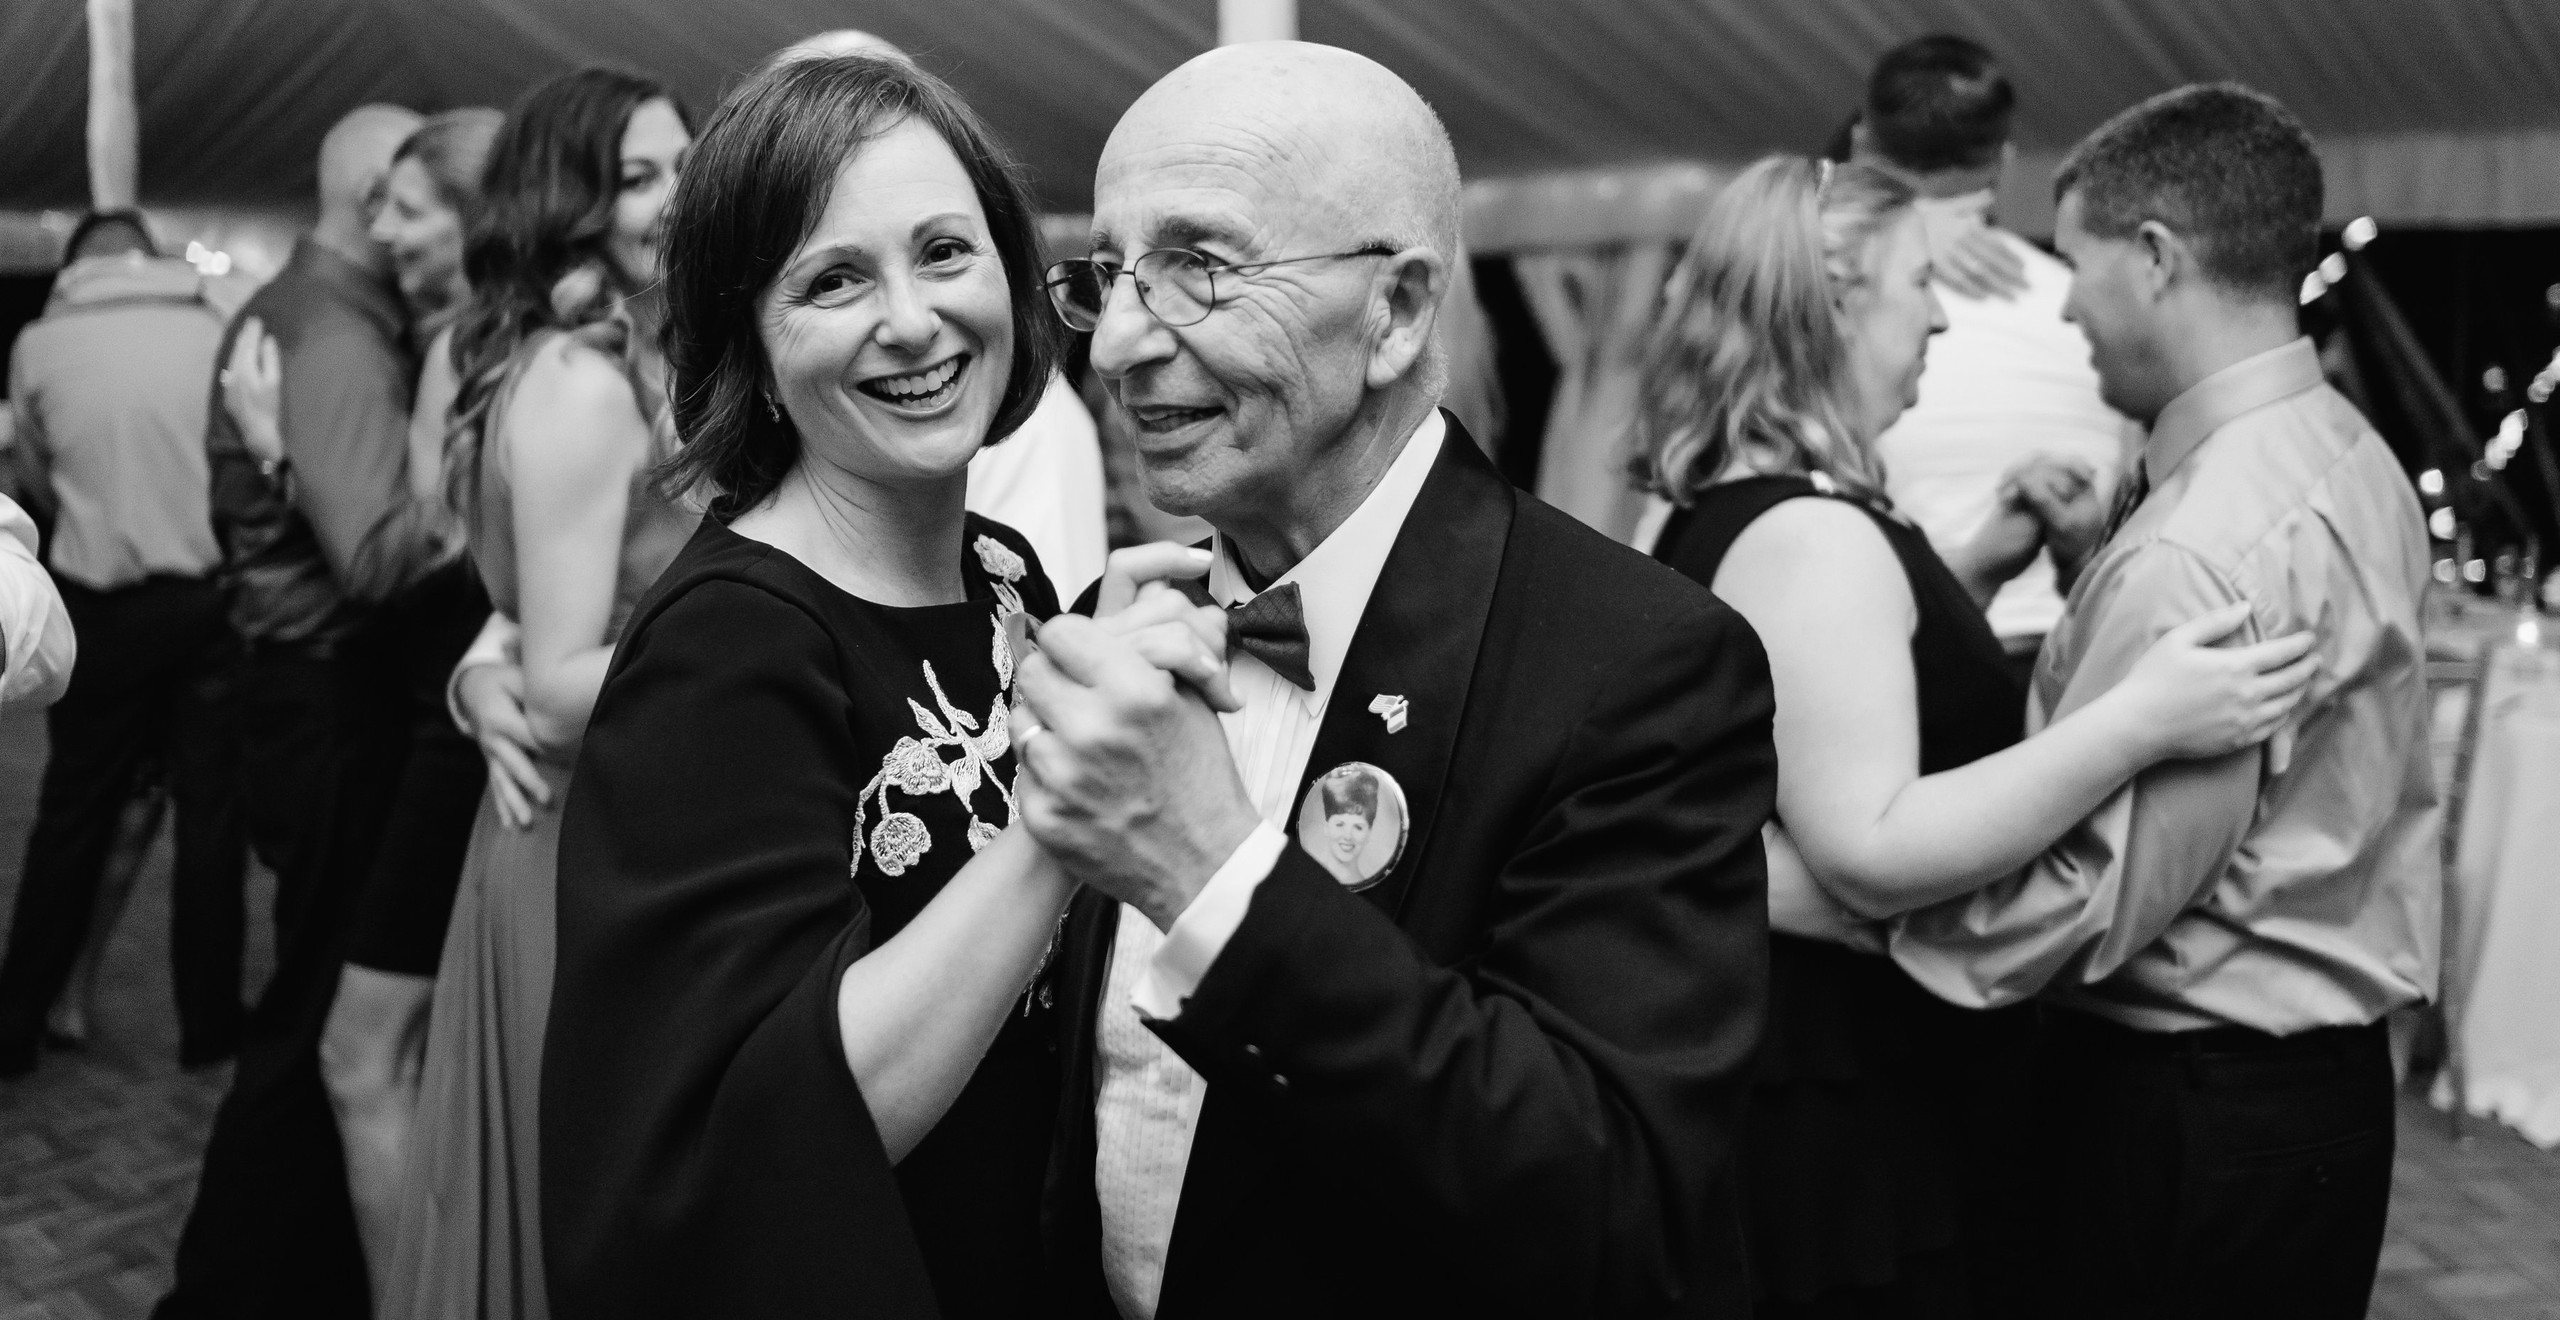 grandfather slow dancing at wedding